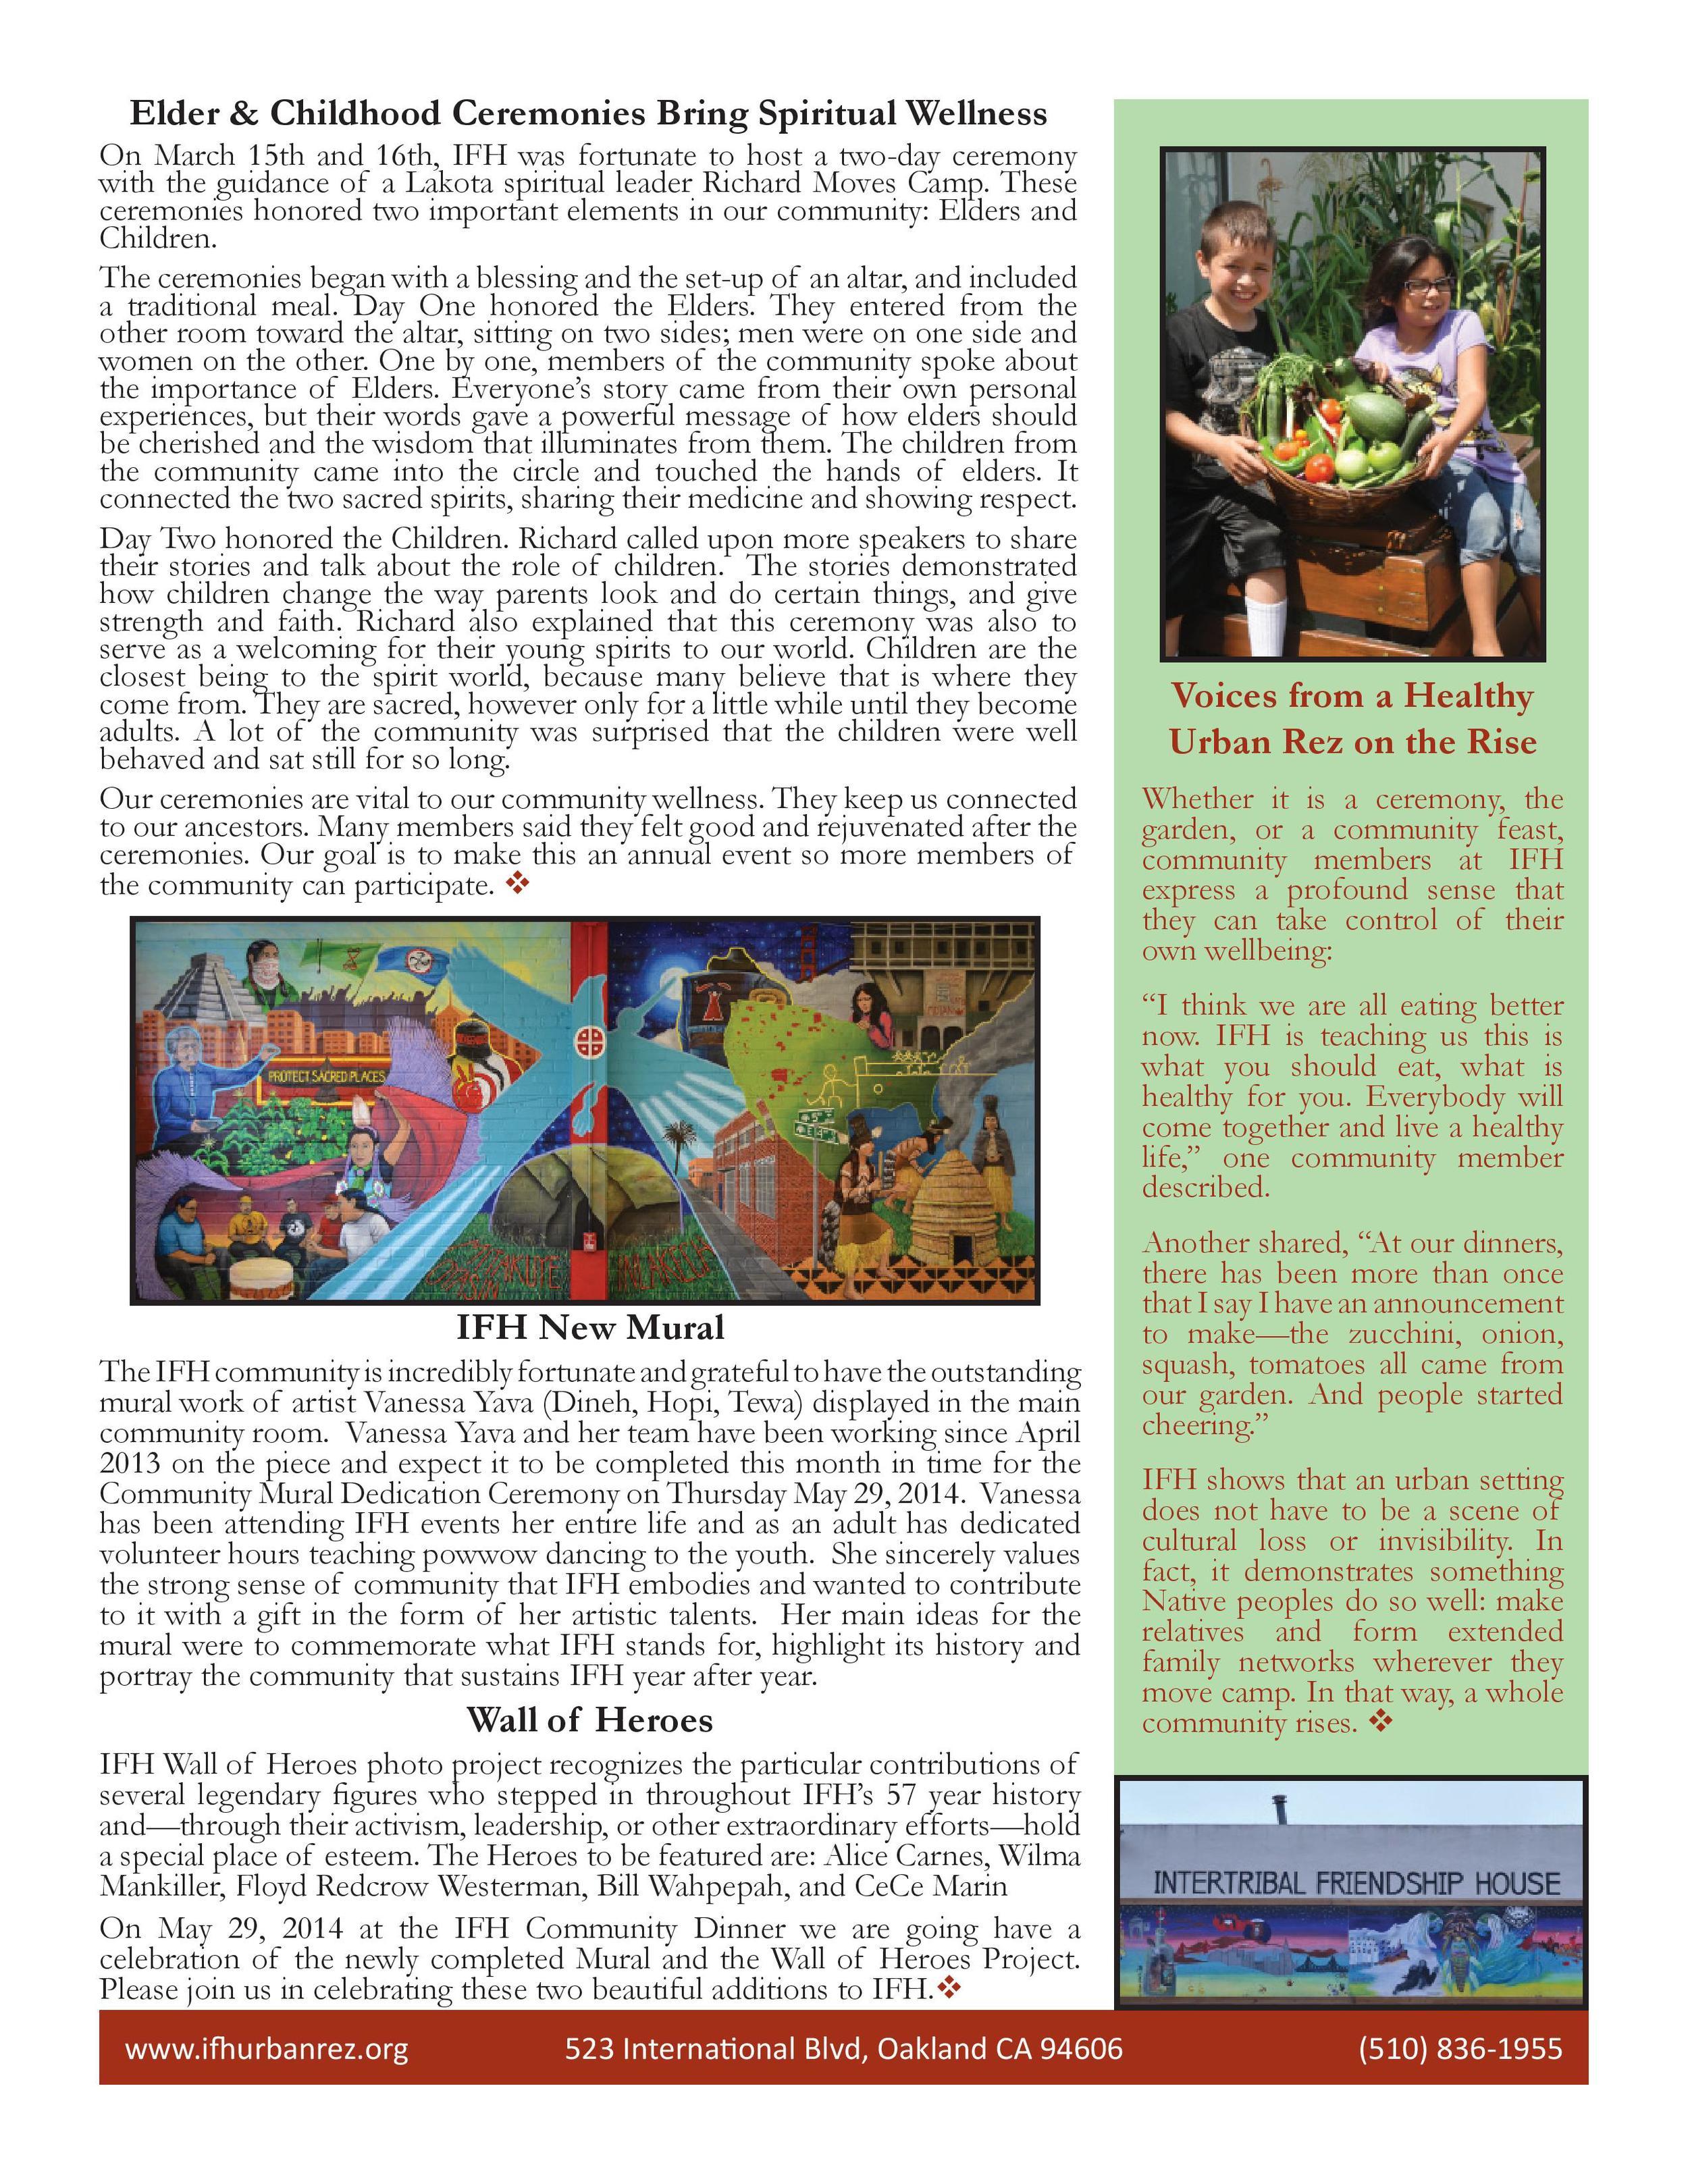 2014-05-08_newslttr-01 (3)-page-002.jpg